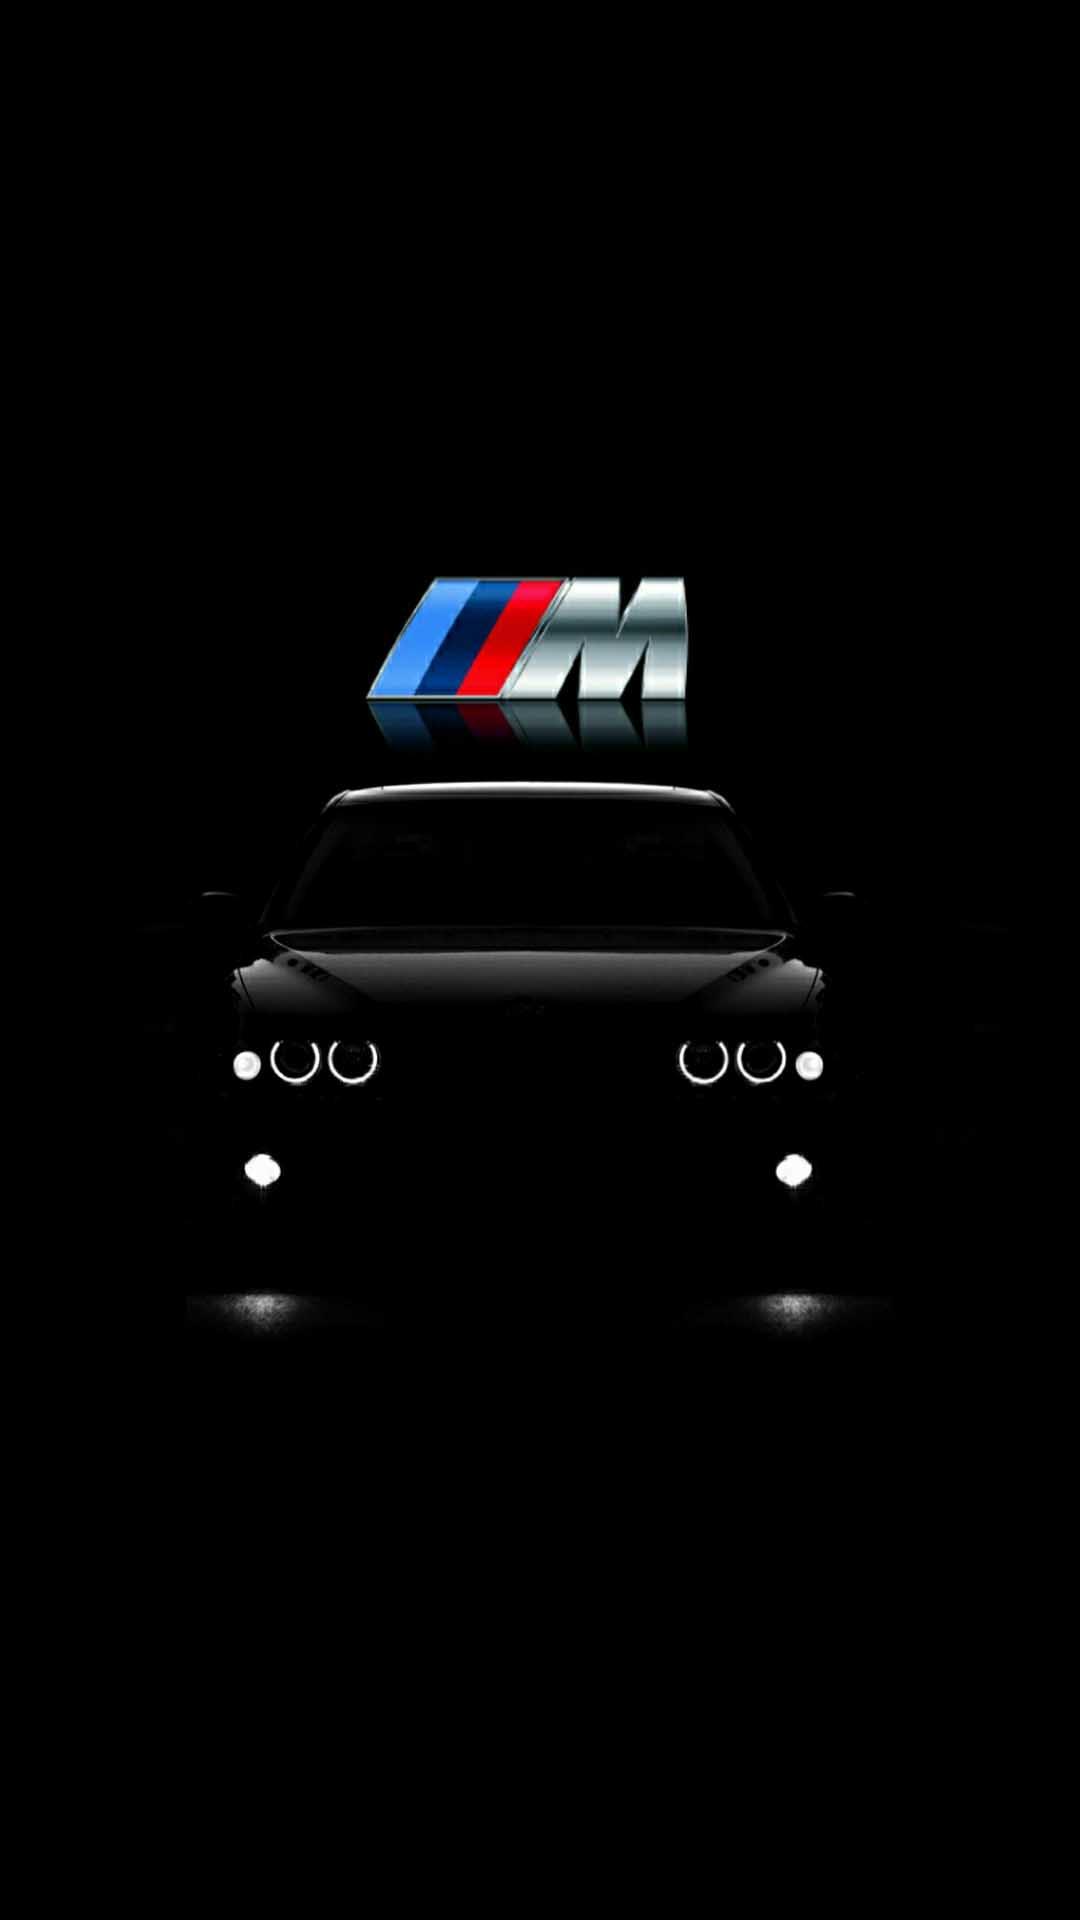 iPhone wallpaper bmw black BMW